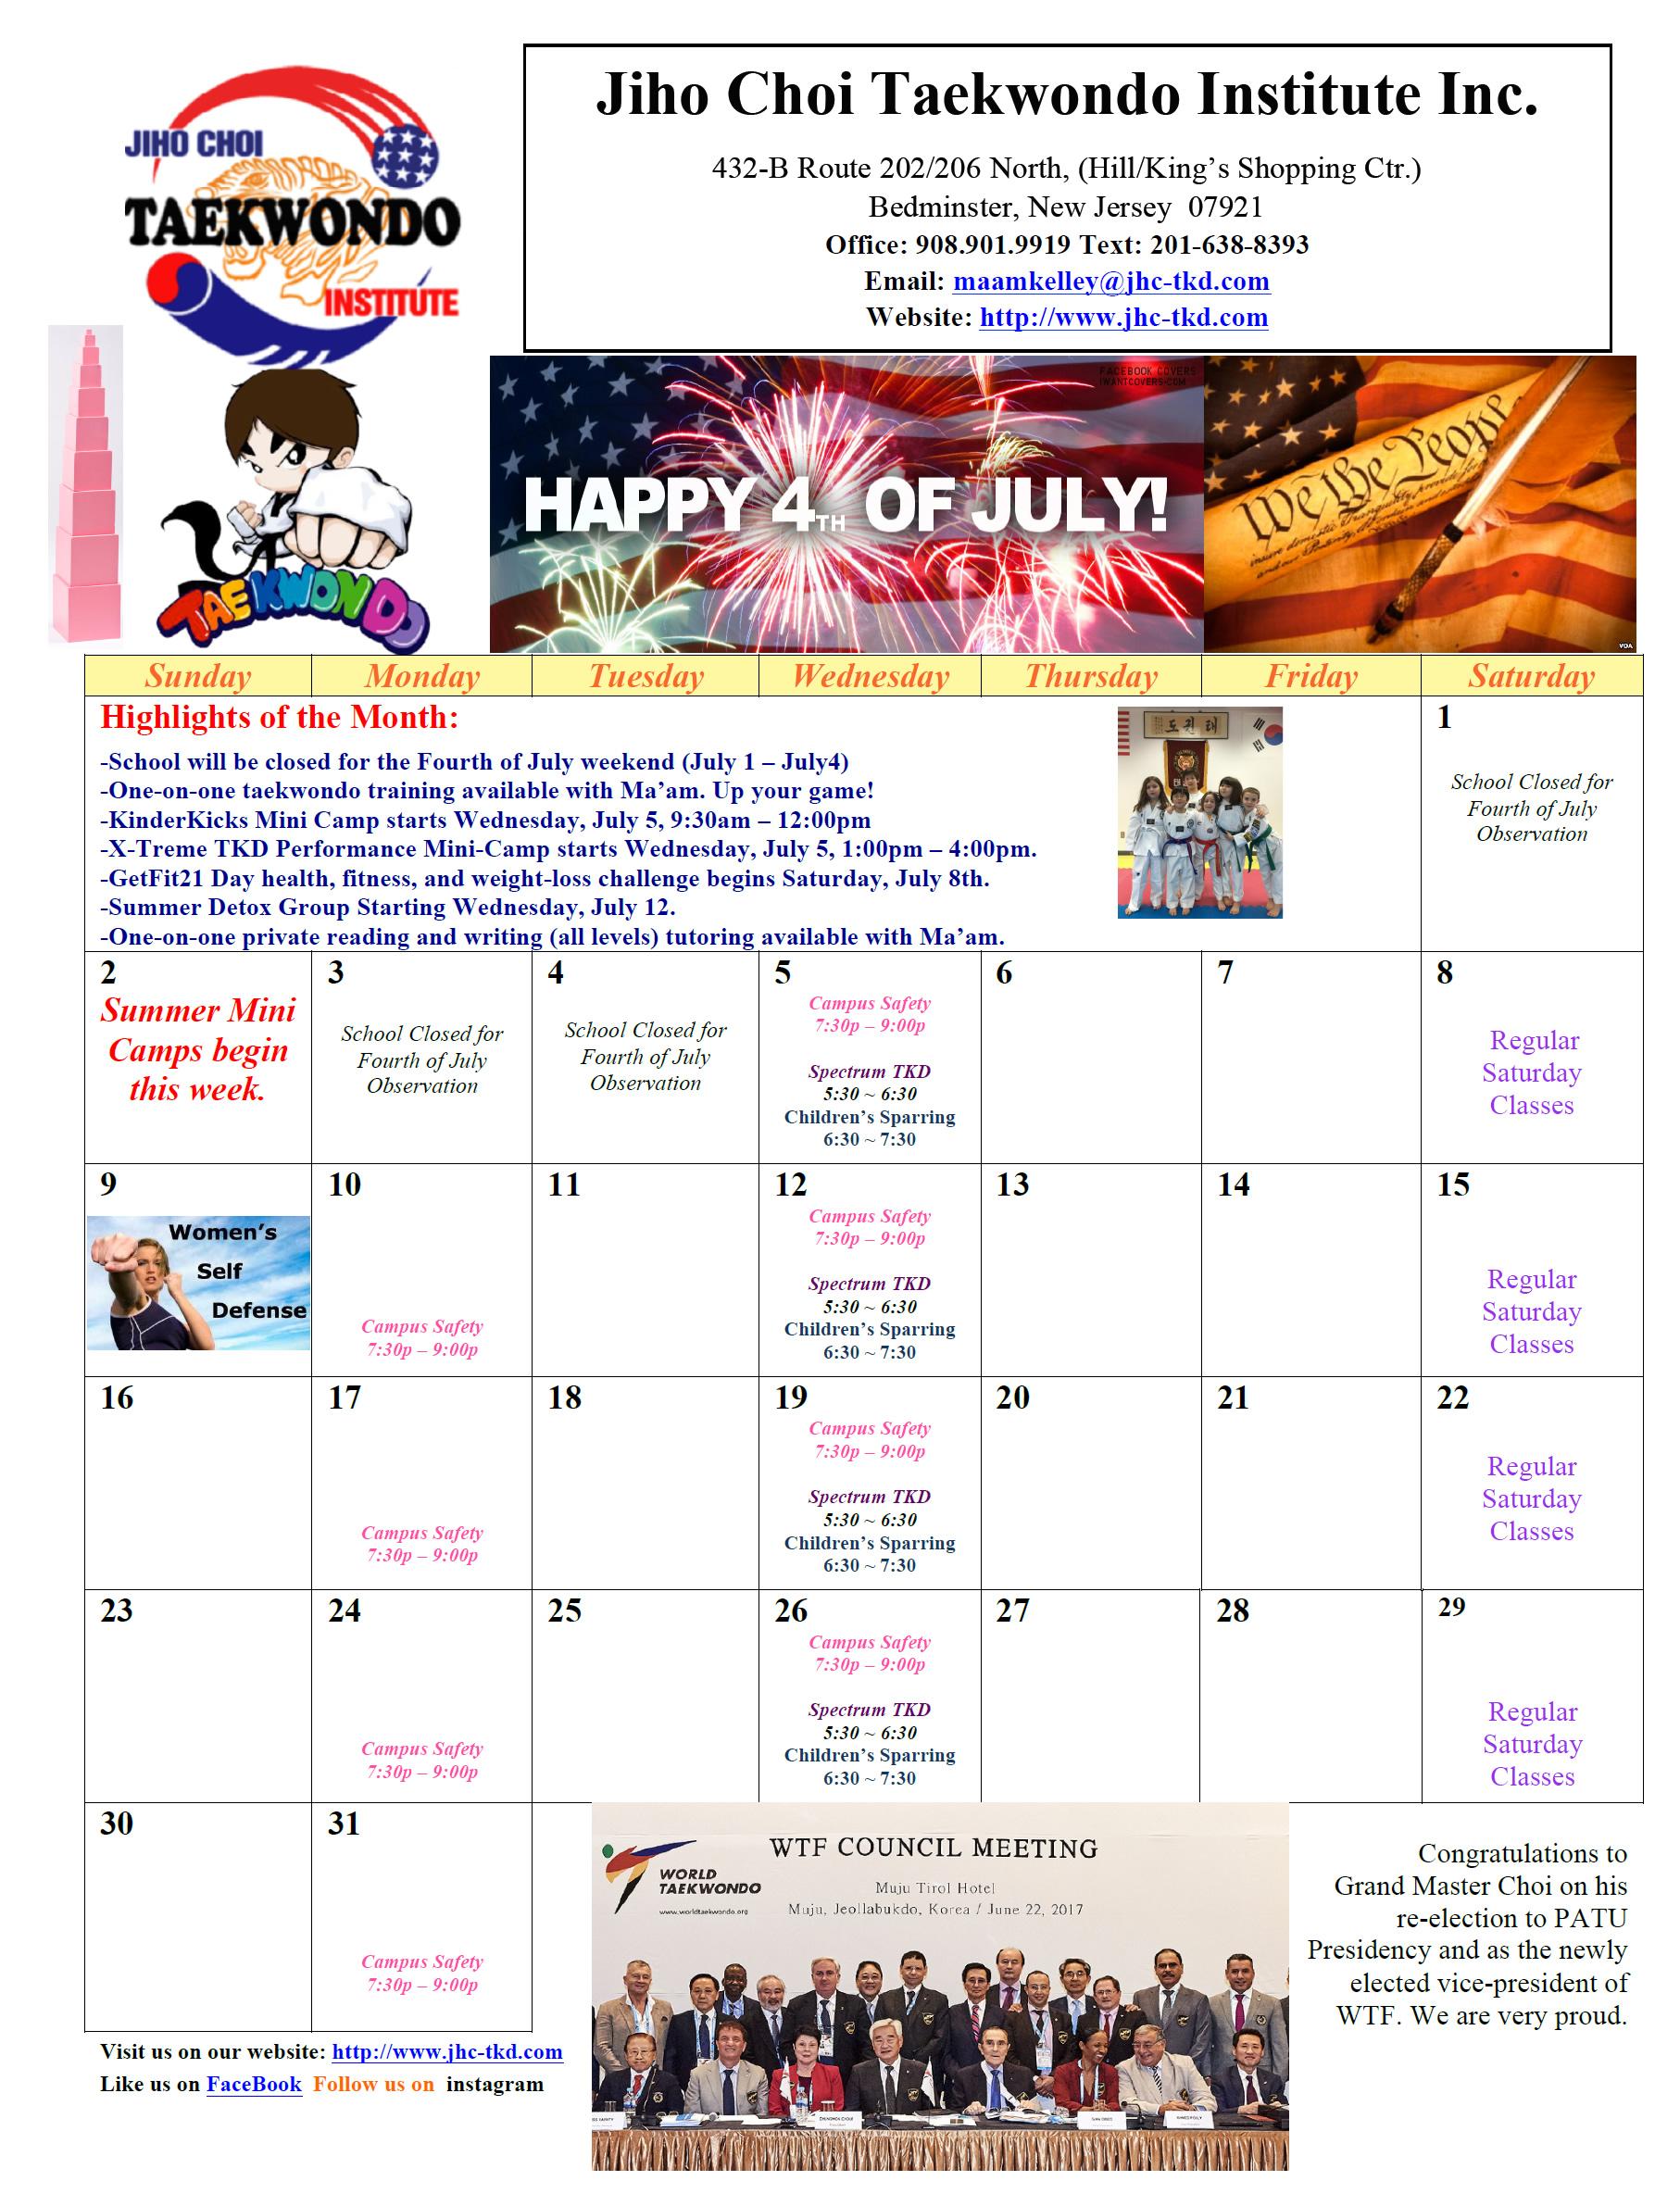 jhc-tkd-calendar-2017-july-fl